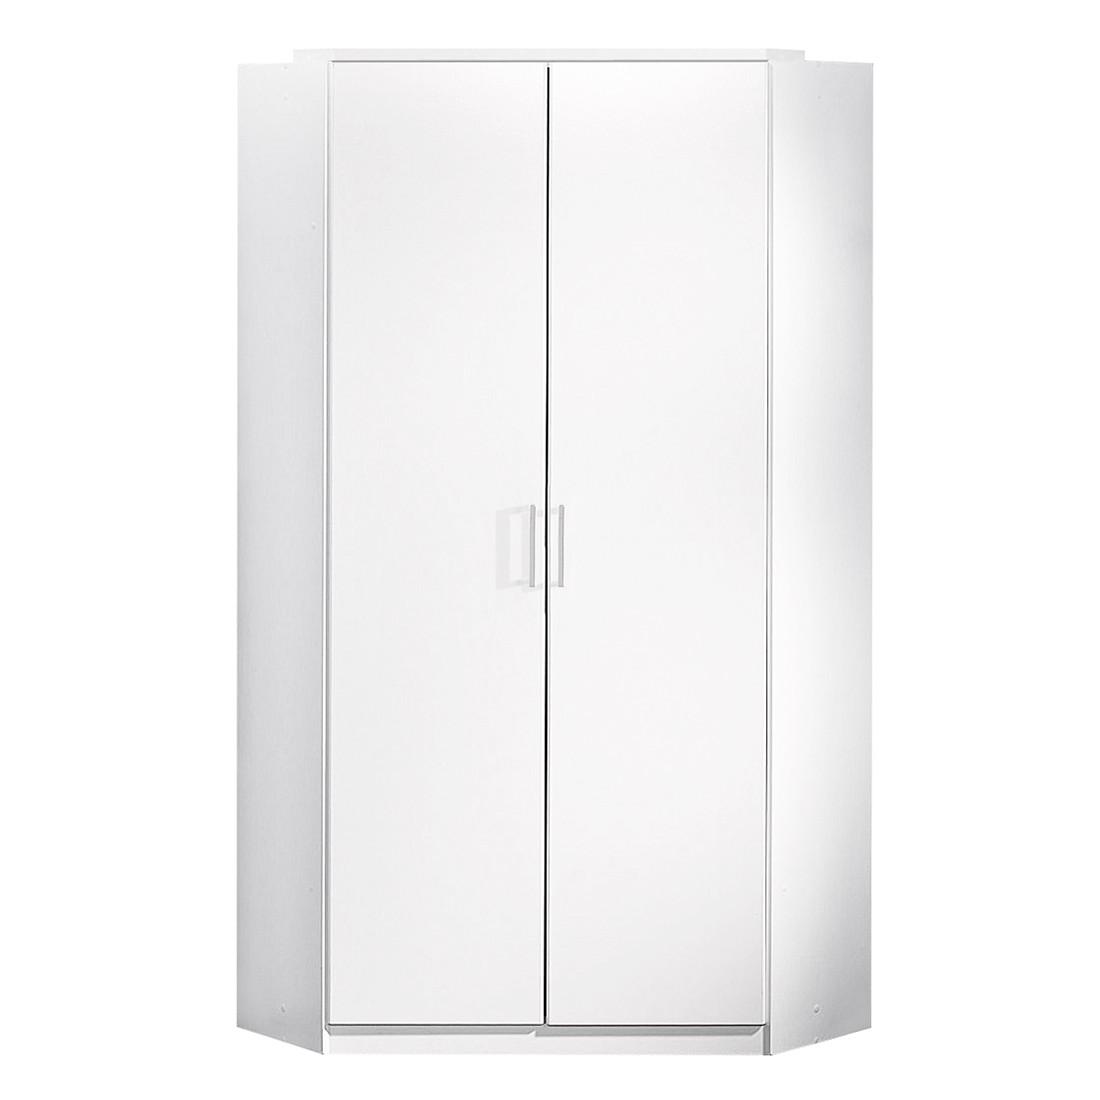 Armoire d'angle Click - Blanc alpin, Wimex